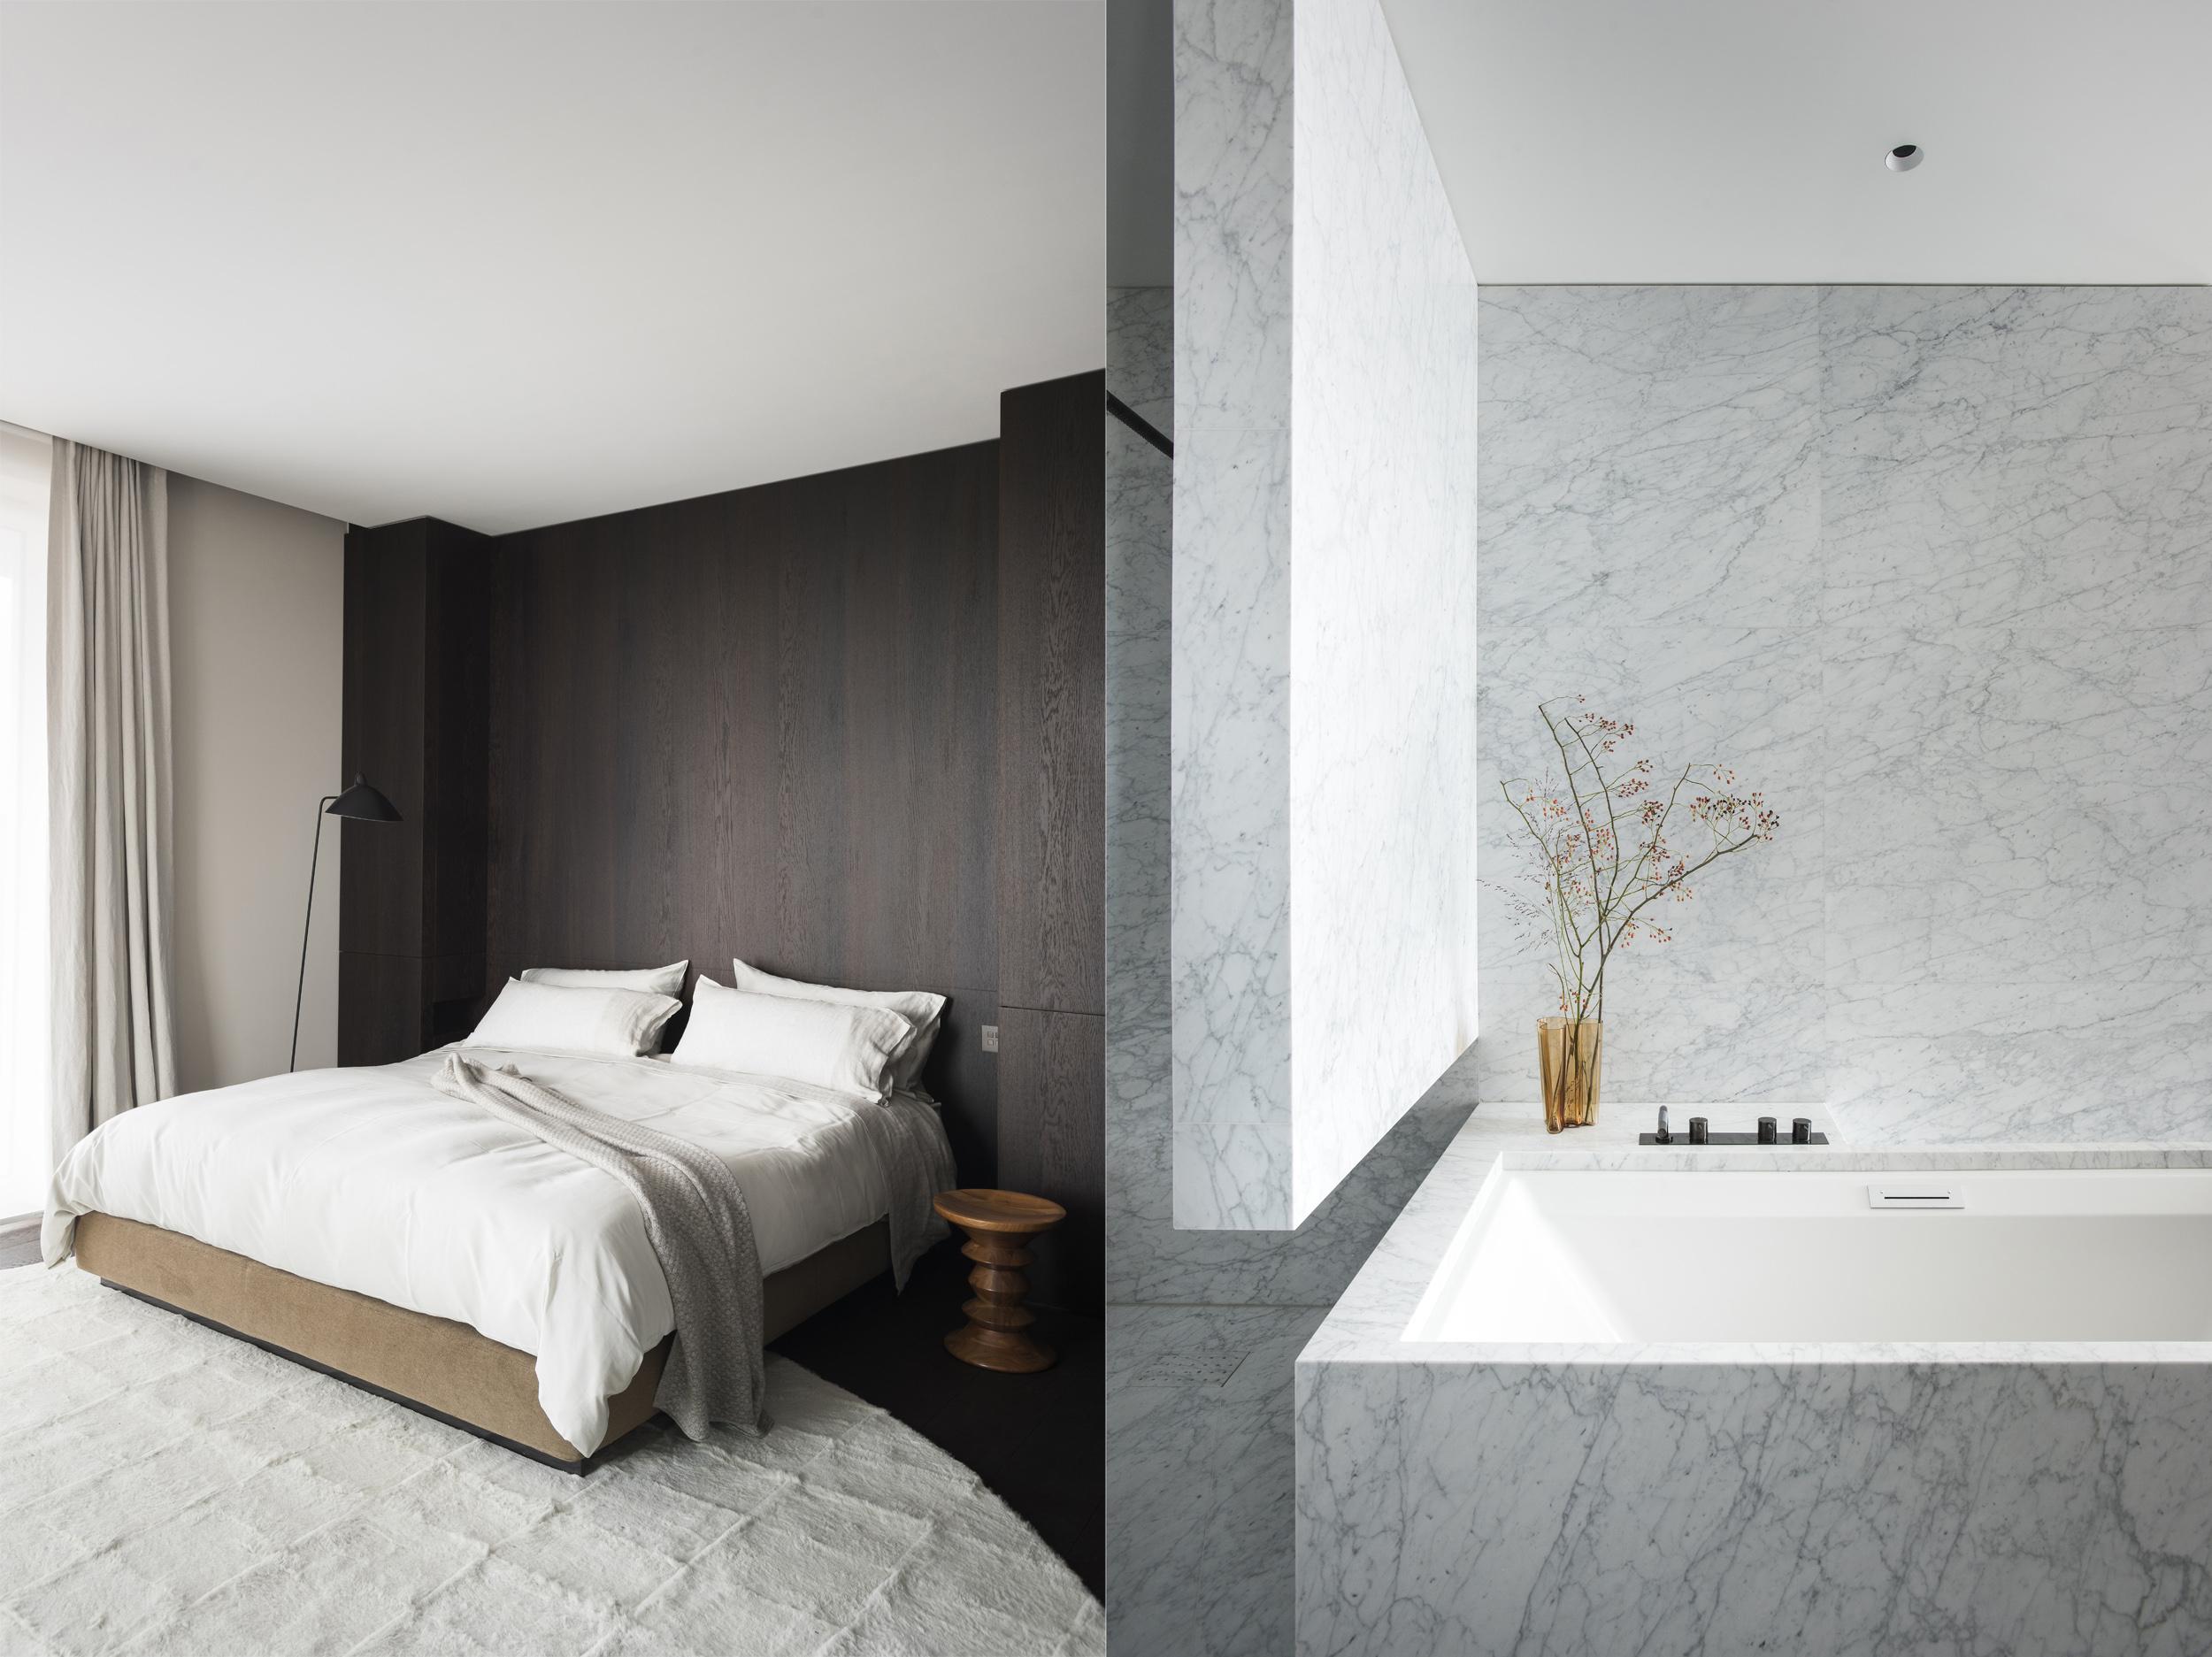 Slaapkamer - badkamer